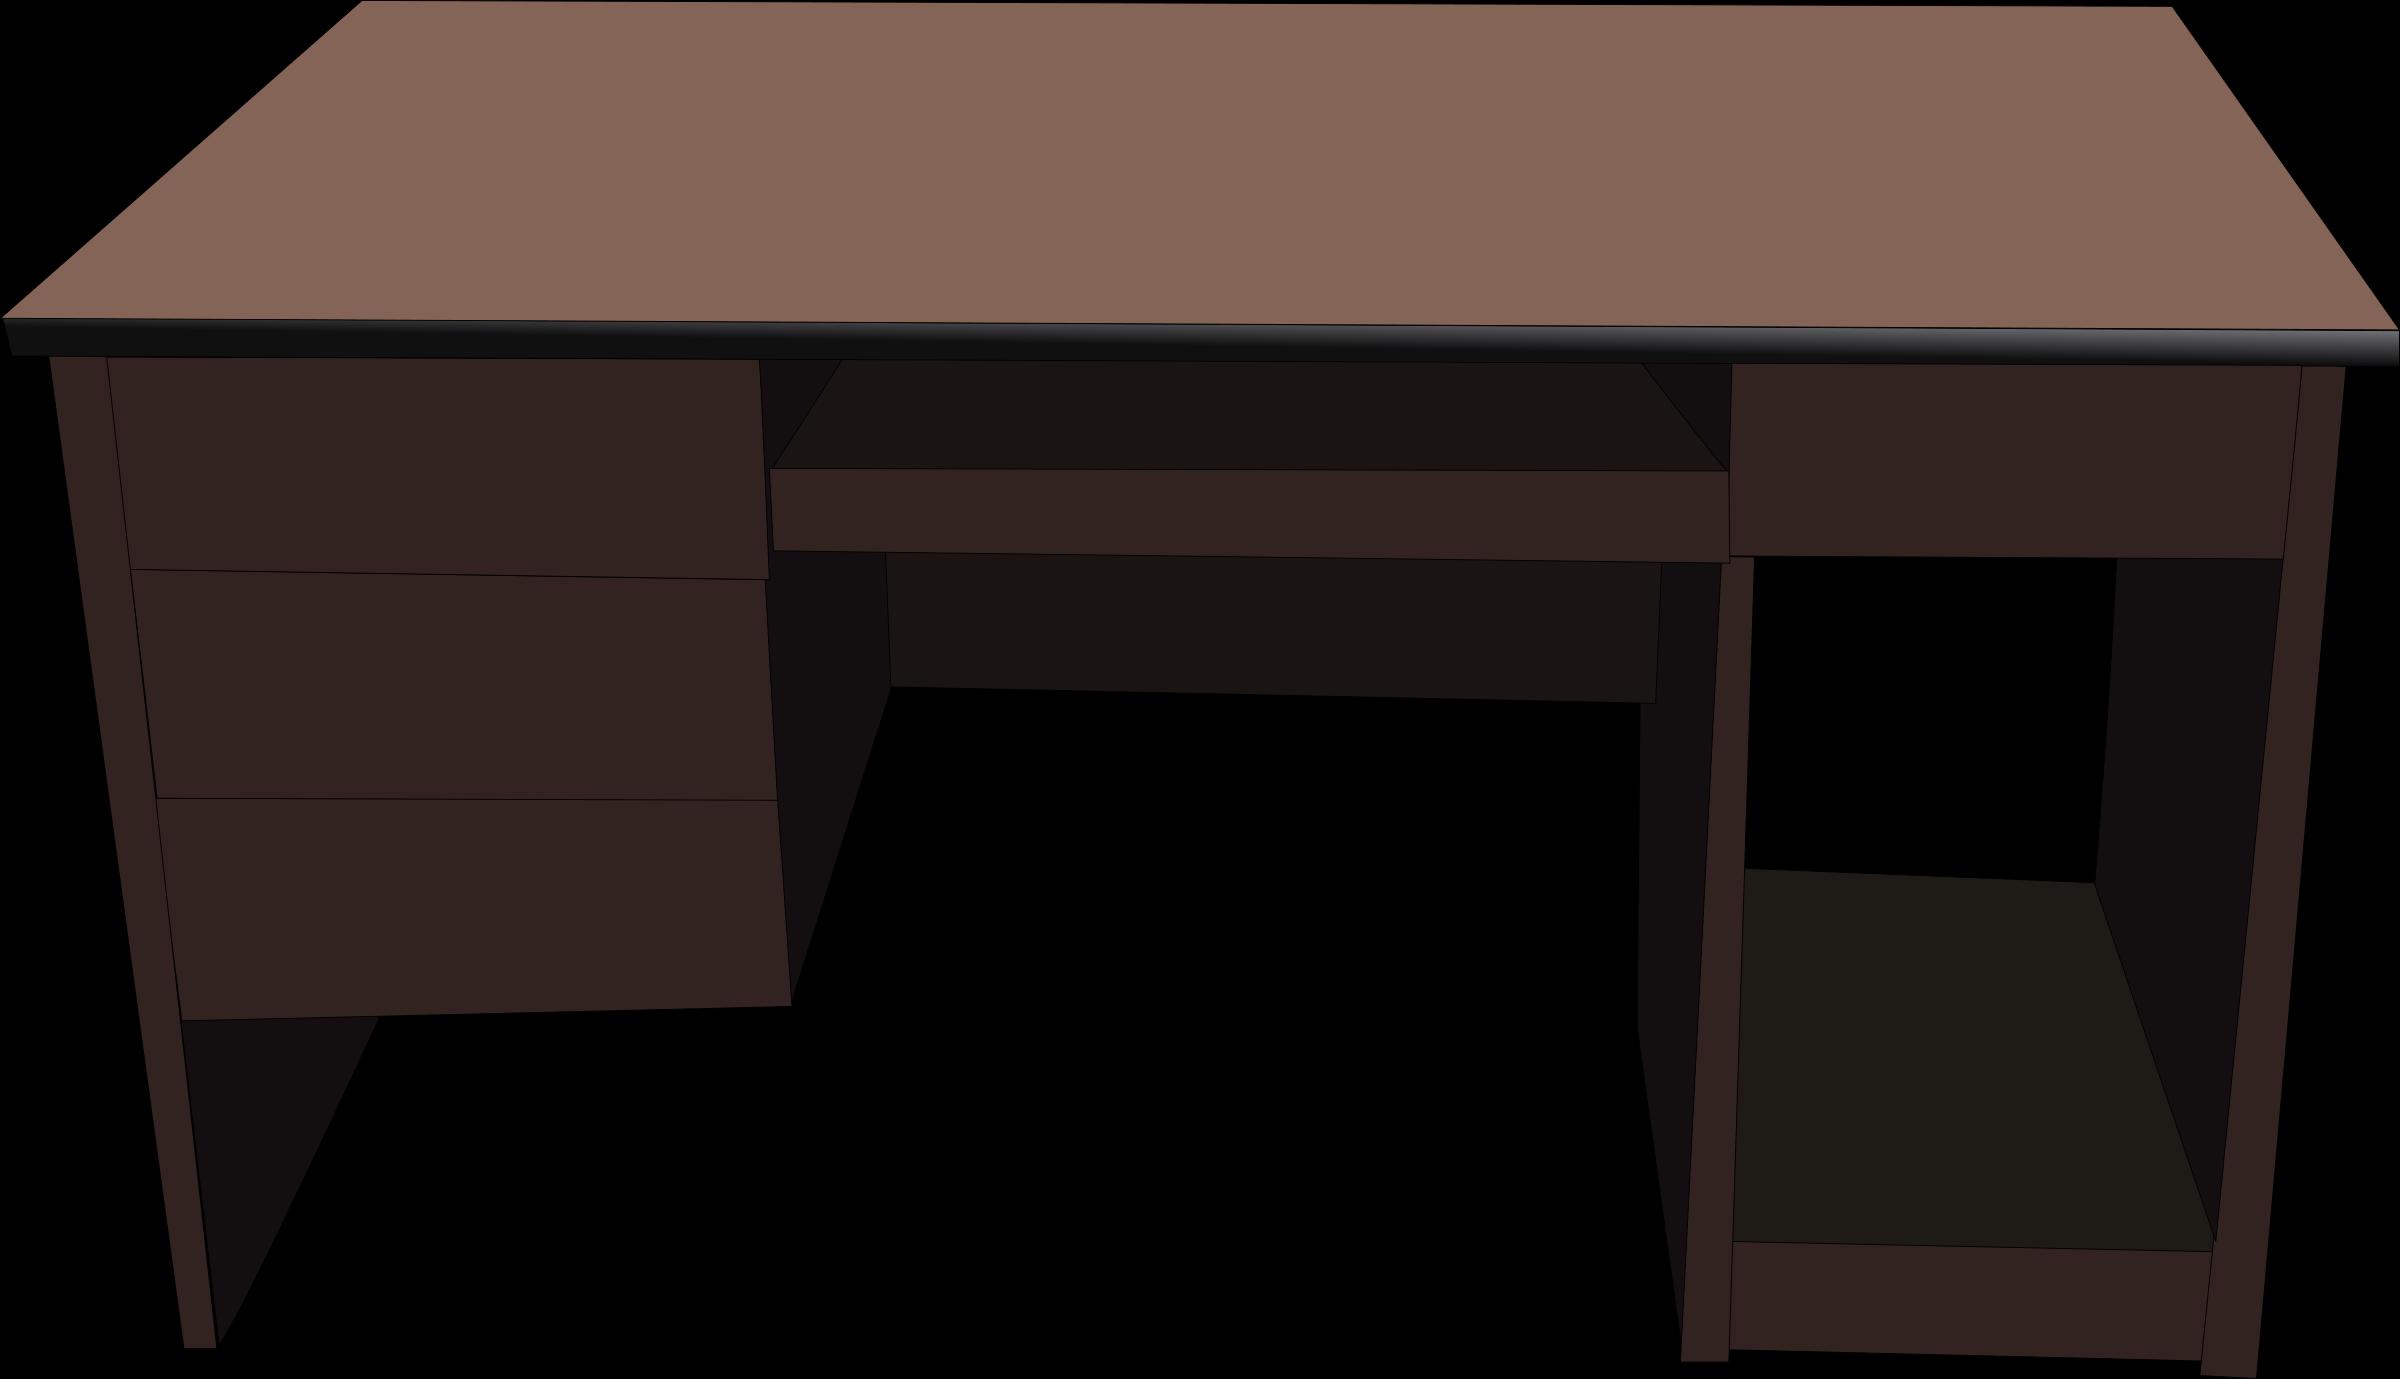 Scotch clipart office desk #8